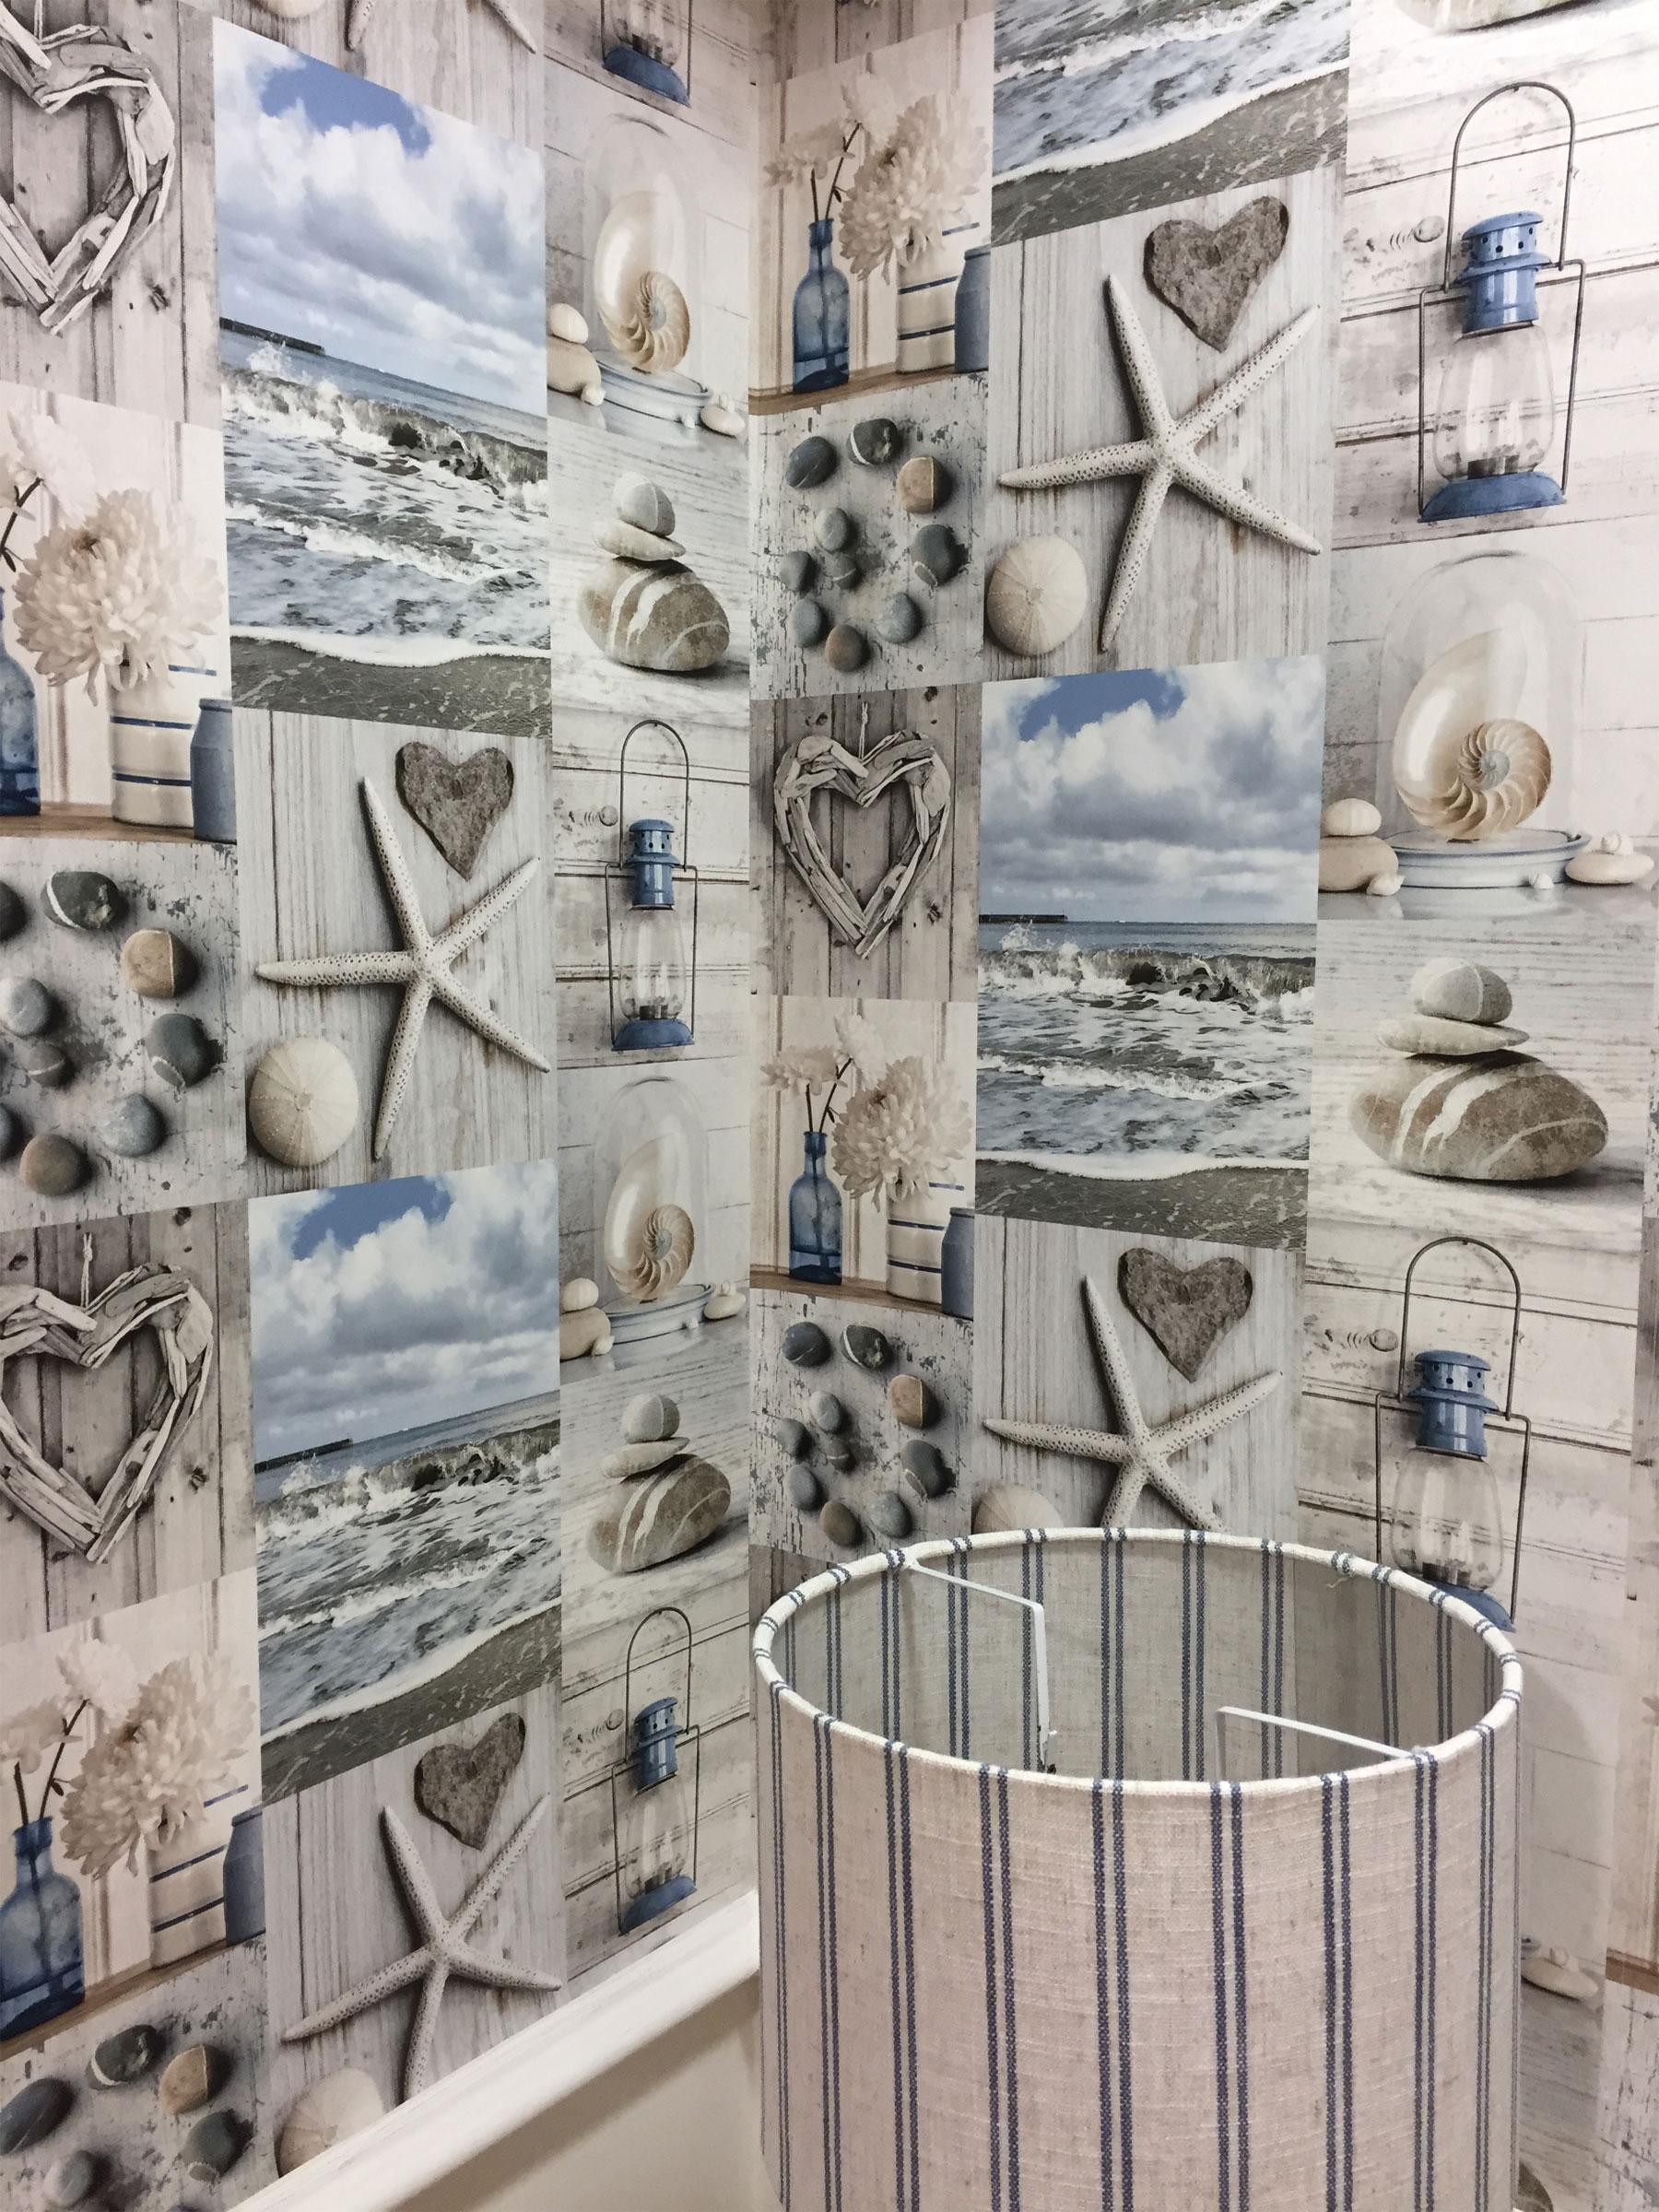 Beach Wallpaper Nautical Bathroom Pebbles Love Hearts Blue Grey Rustic Maritime 5050192699006 Ebay